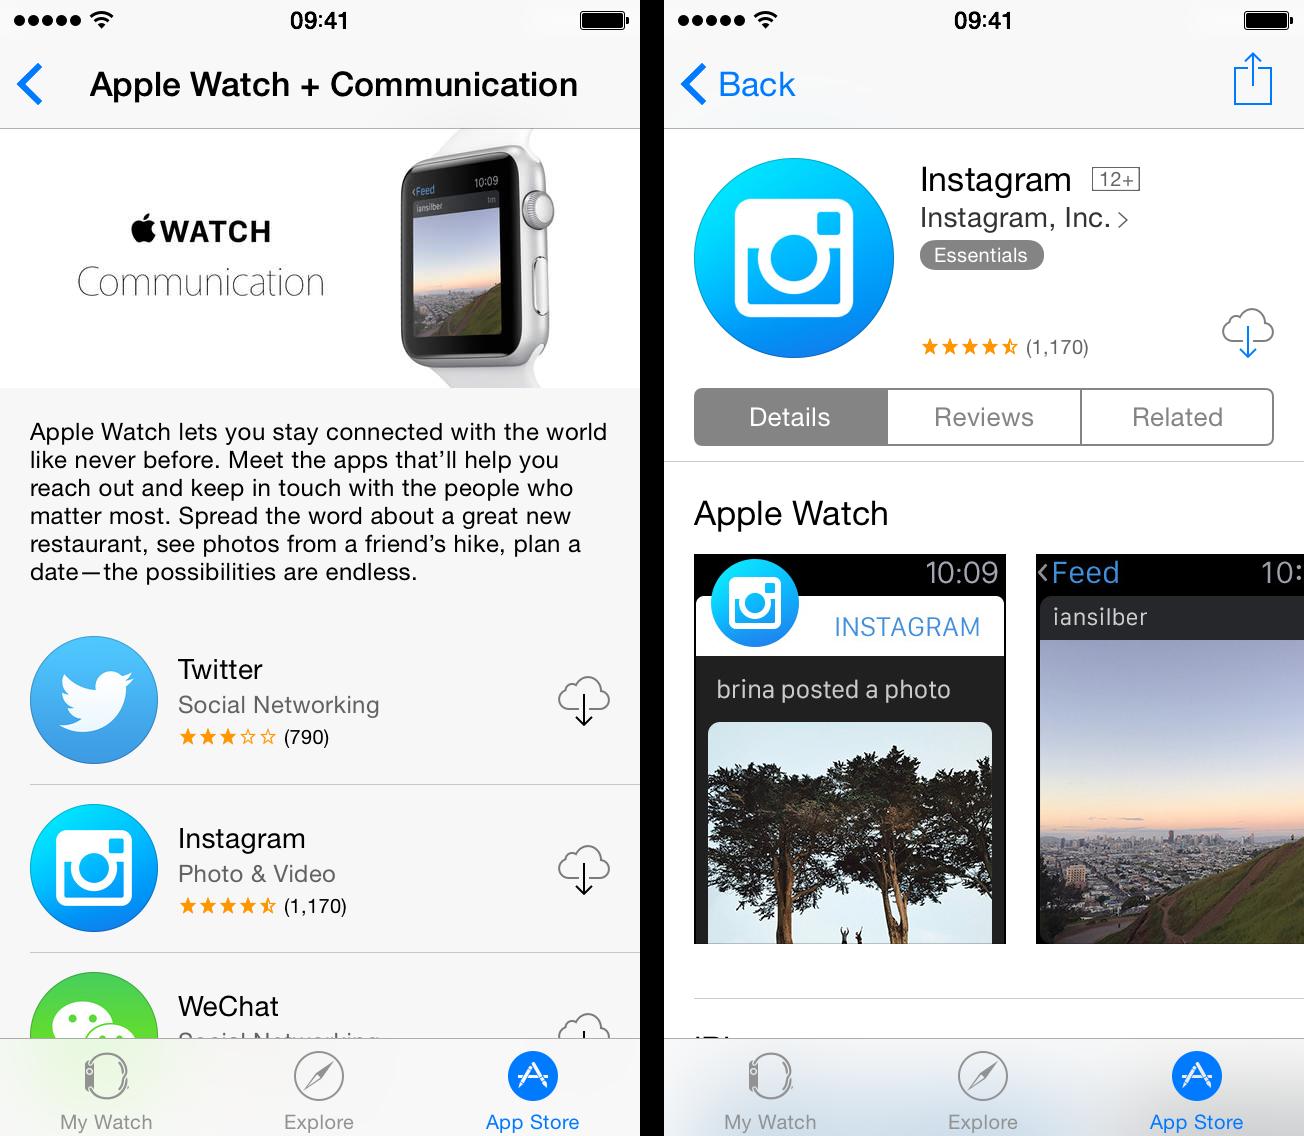 Apple Watch App Store Instagram